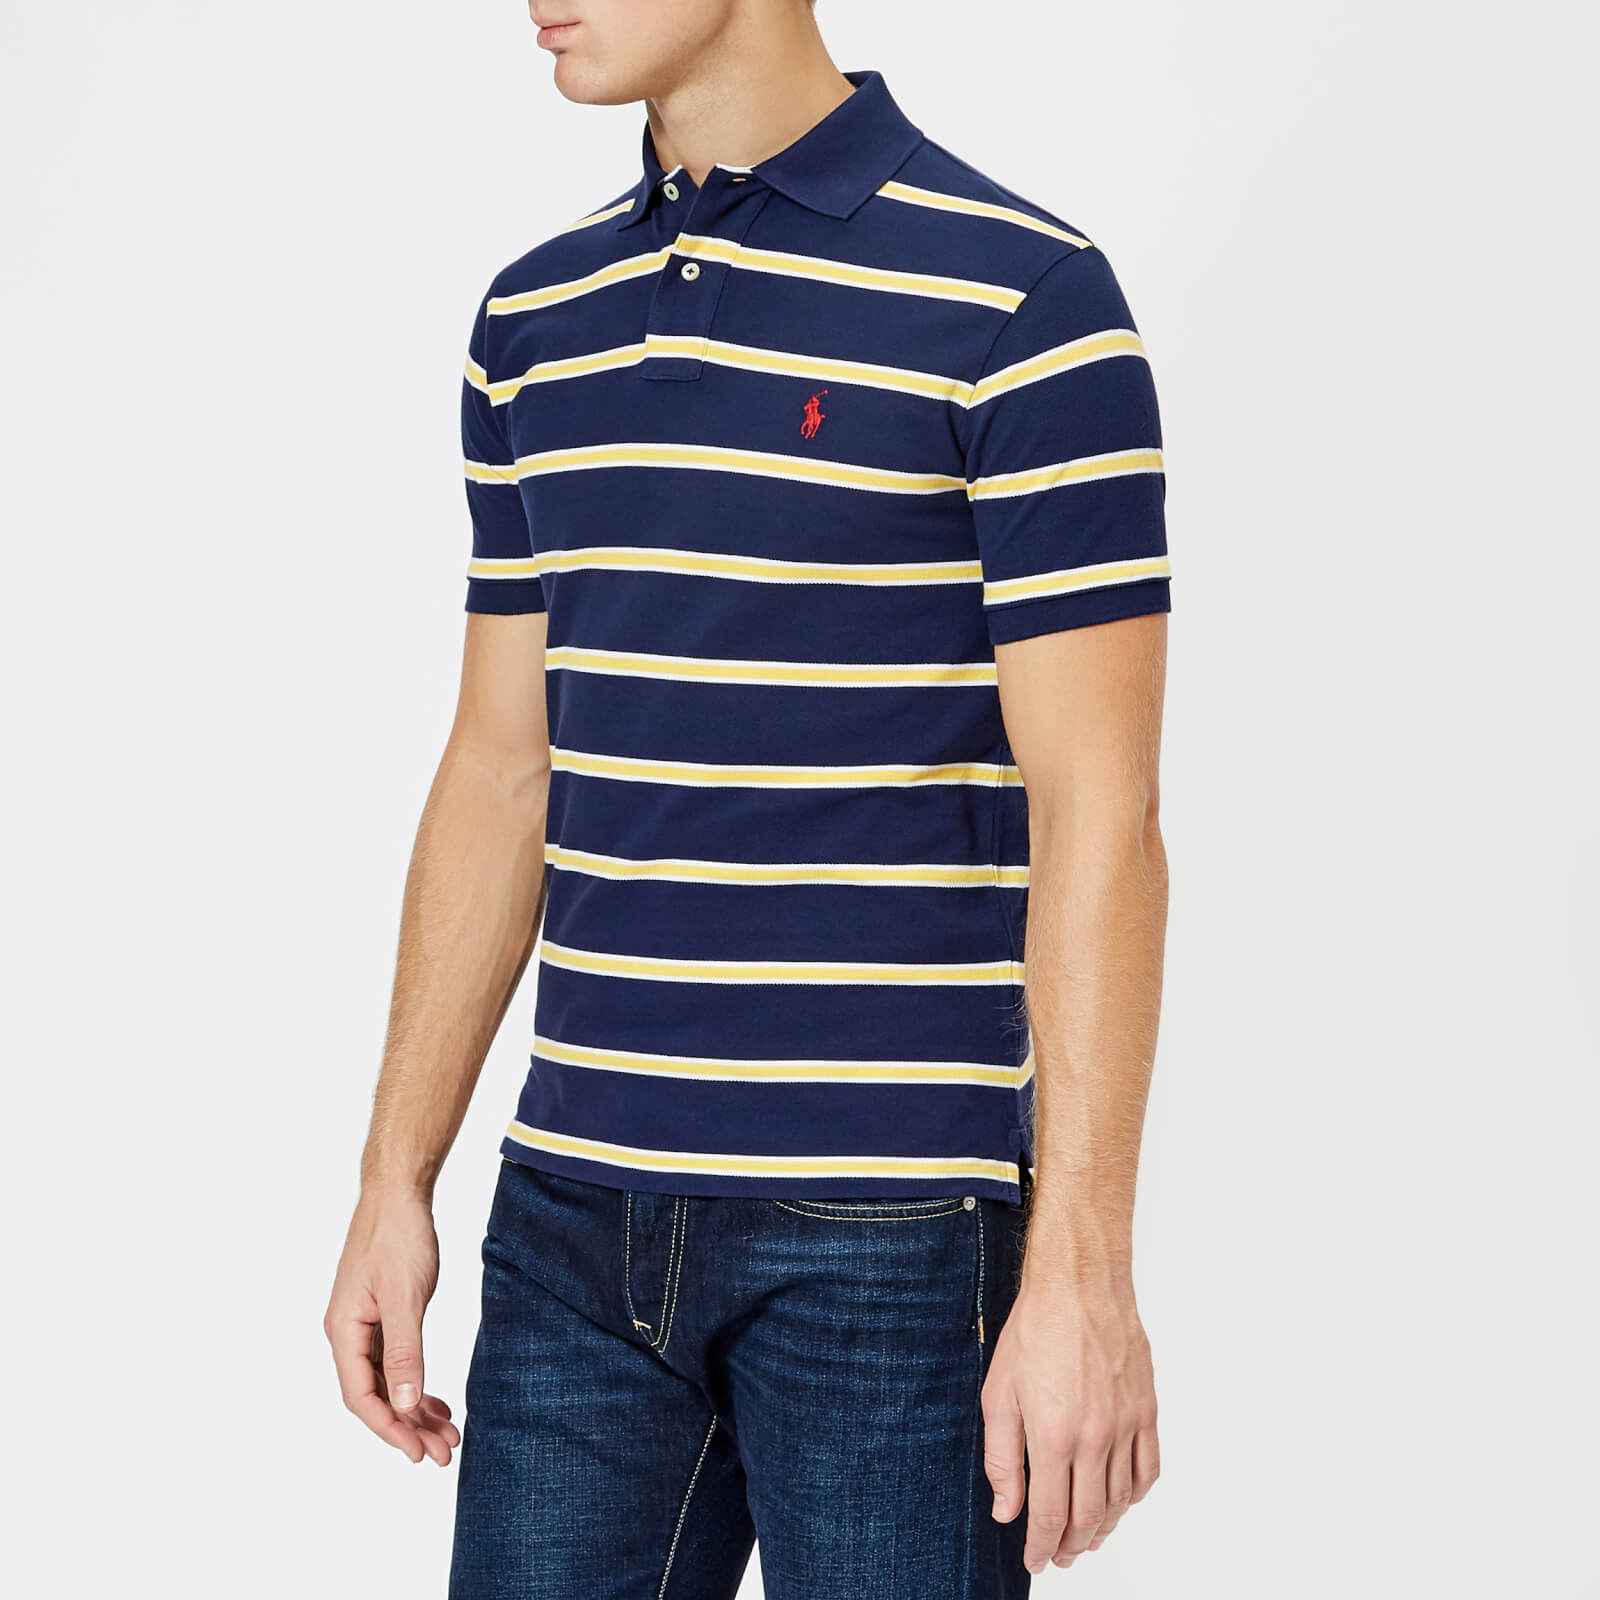 44e60a16 Polo Ralph Lauren Men's Stripe Short Sleeve Polo Shirt - Newport Navy/Artic  Yellow - Free UK Delivery over £50